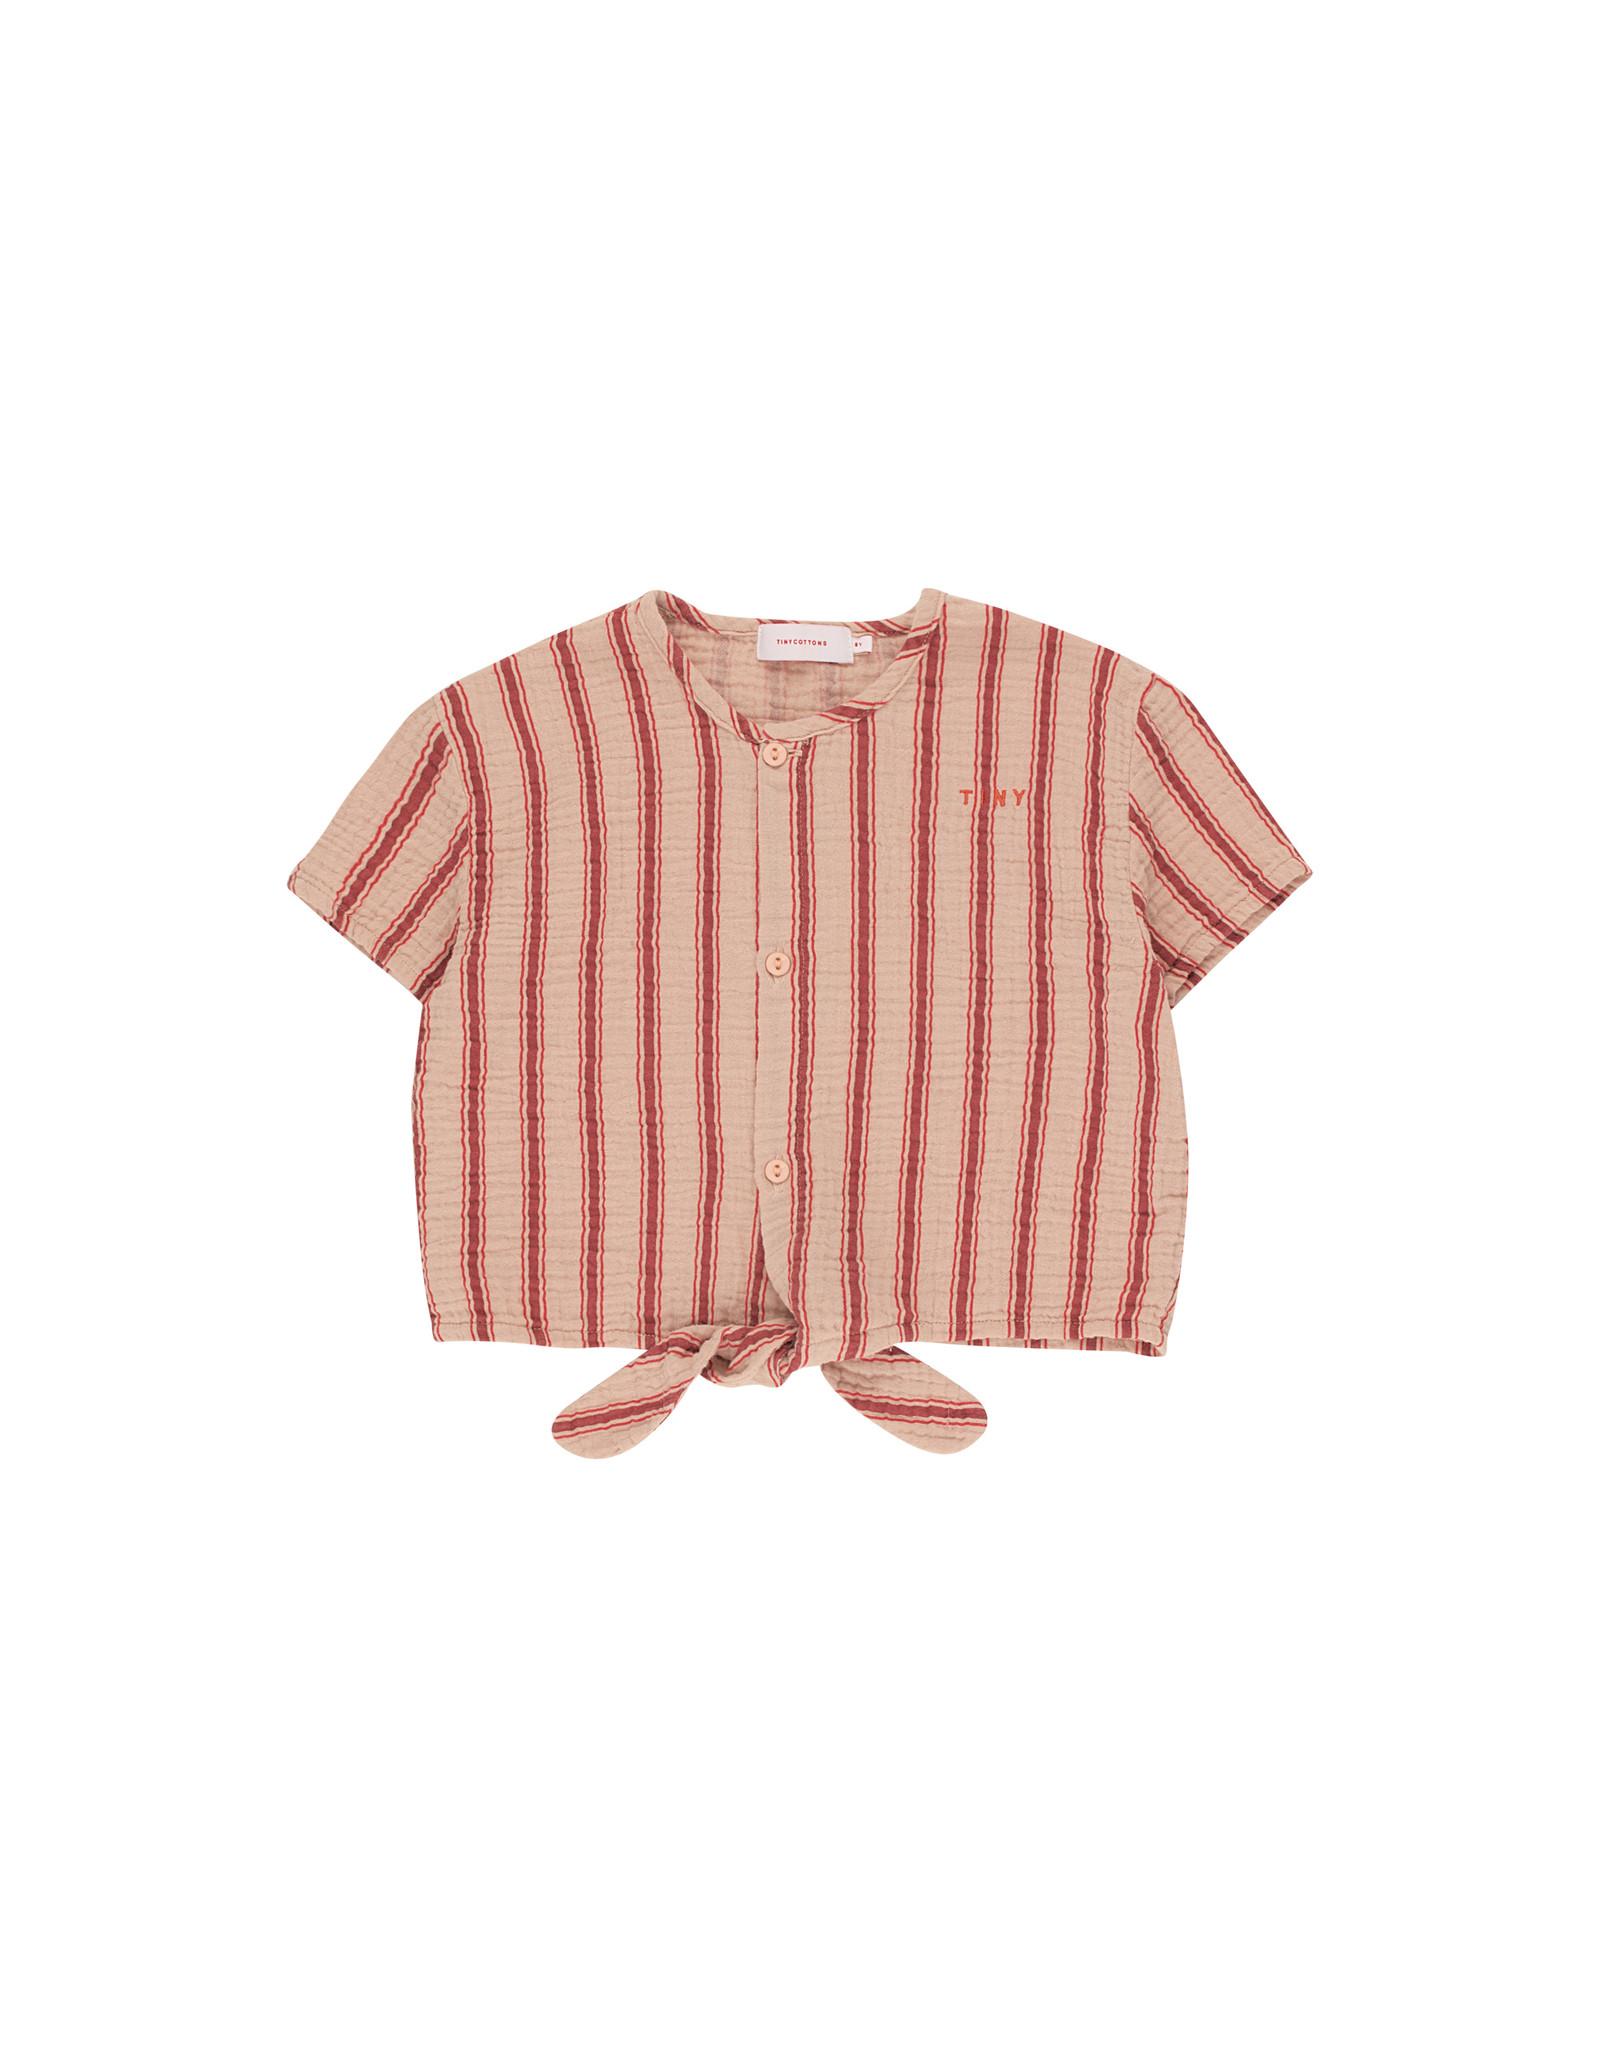 "Tinycottons ""Retro stripes"" tie front top"